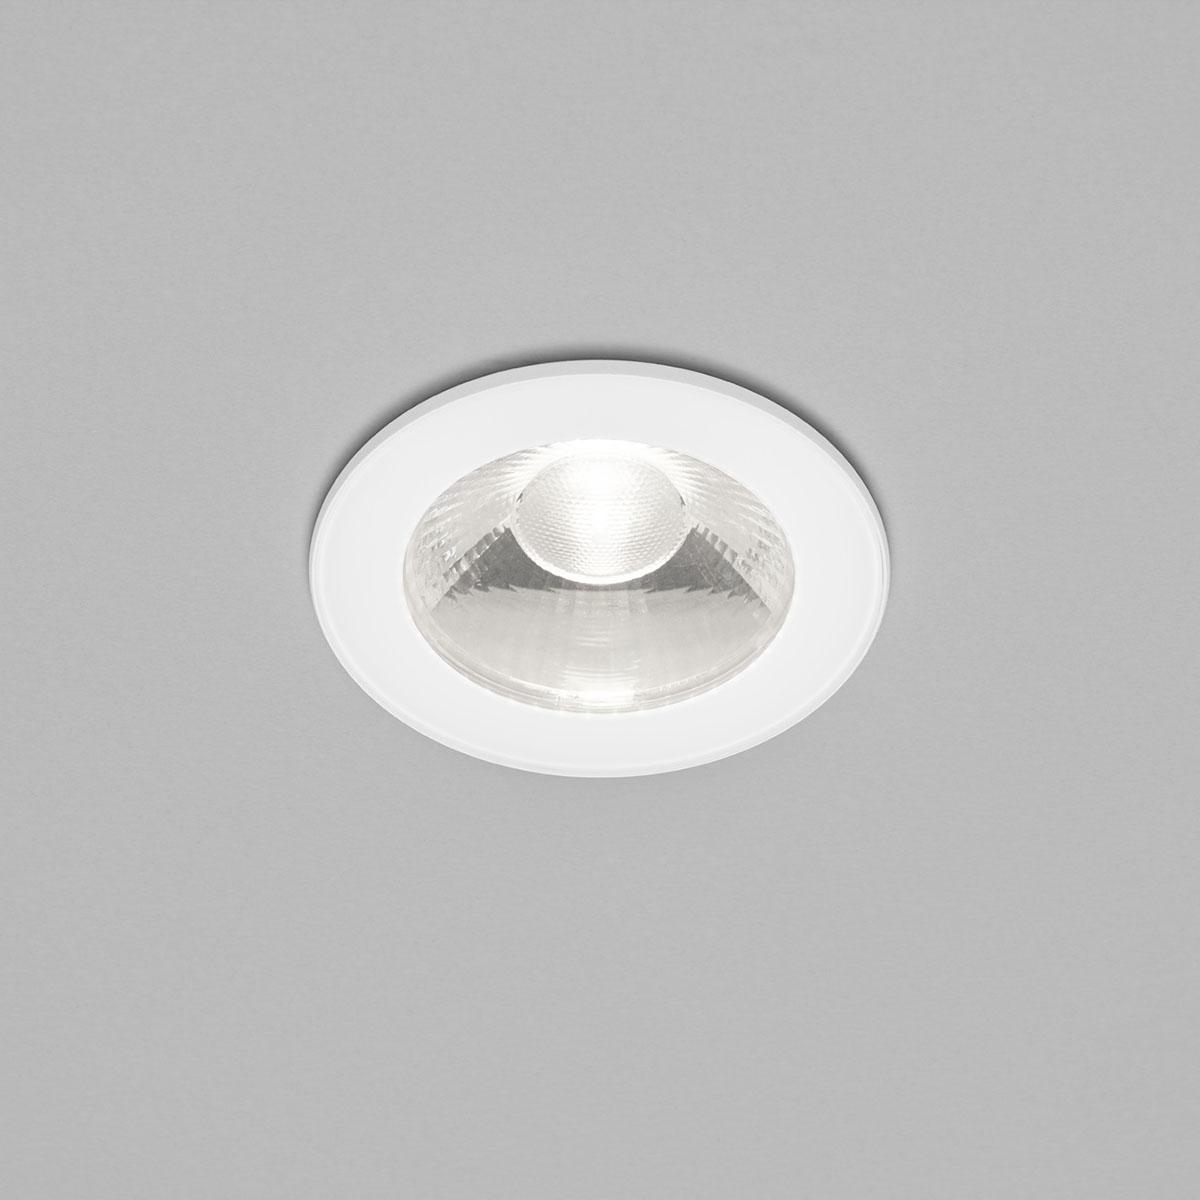 Helestra Oso LED Deckeneinbaustrahler, rund